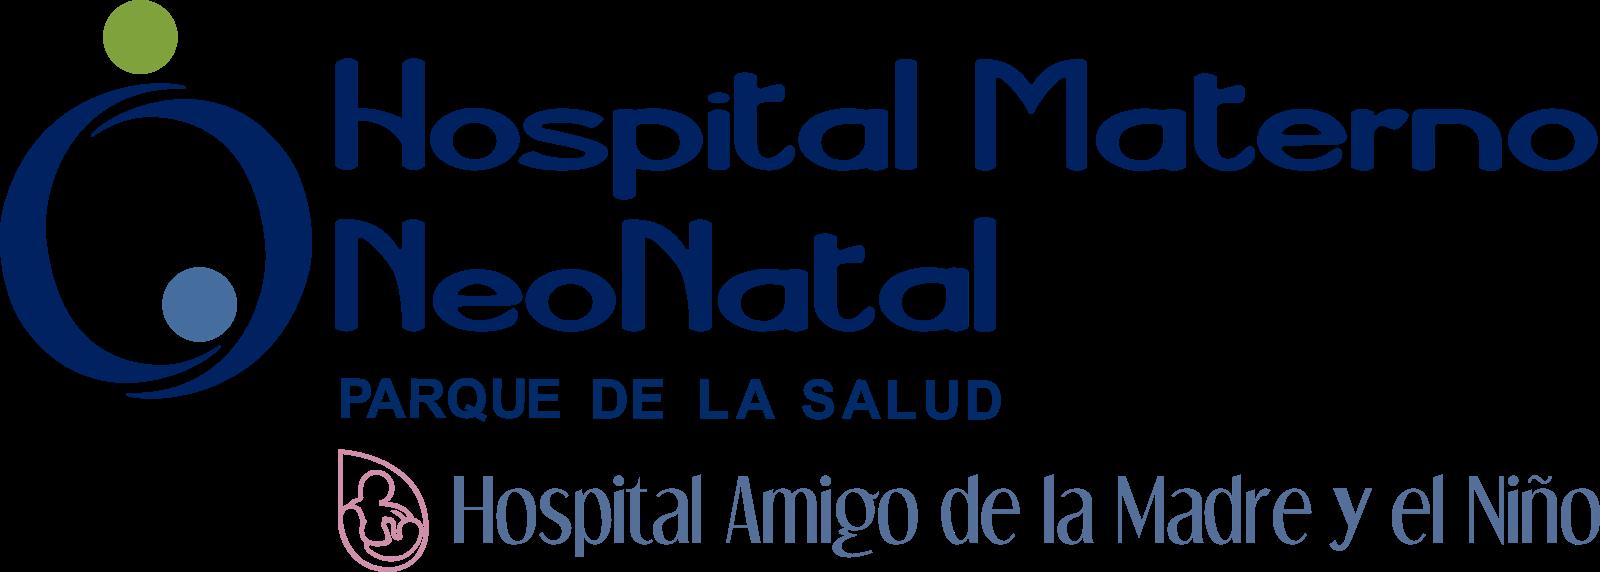 Hospital Materno NeoNatal